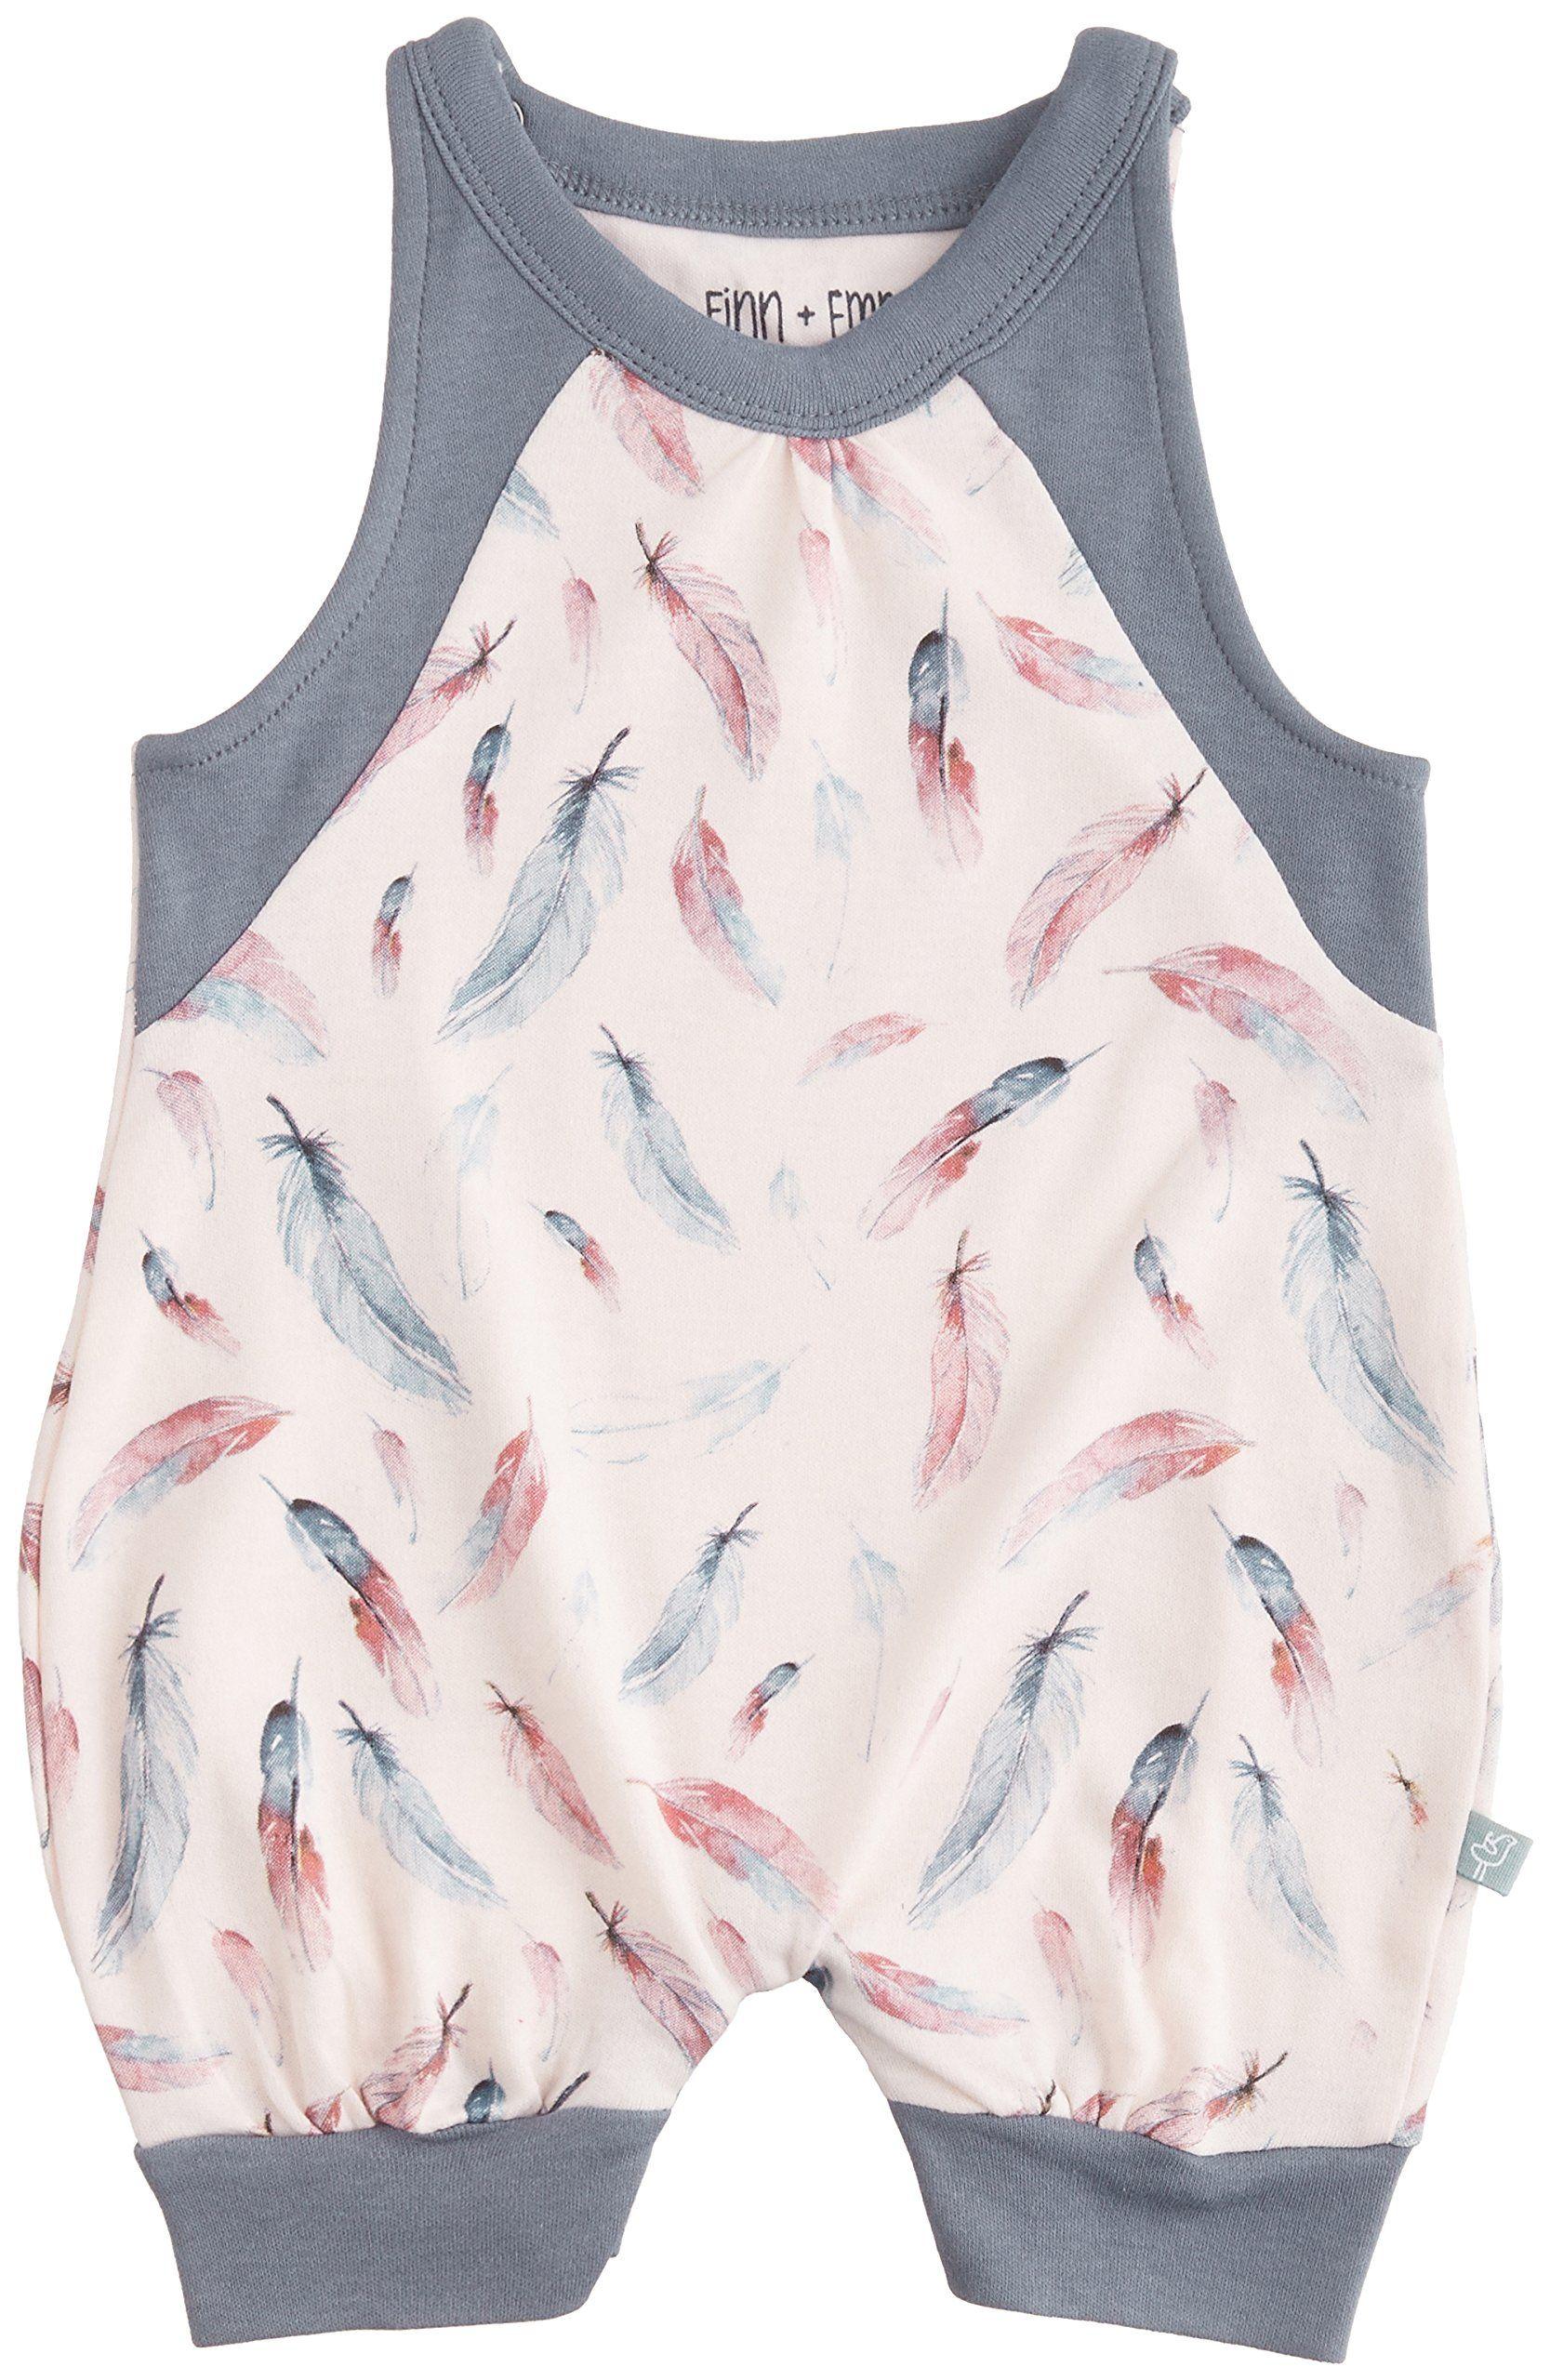 Amazon.com: Finn + Emma Baby Girl Organic Cotton Romper: Clothing